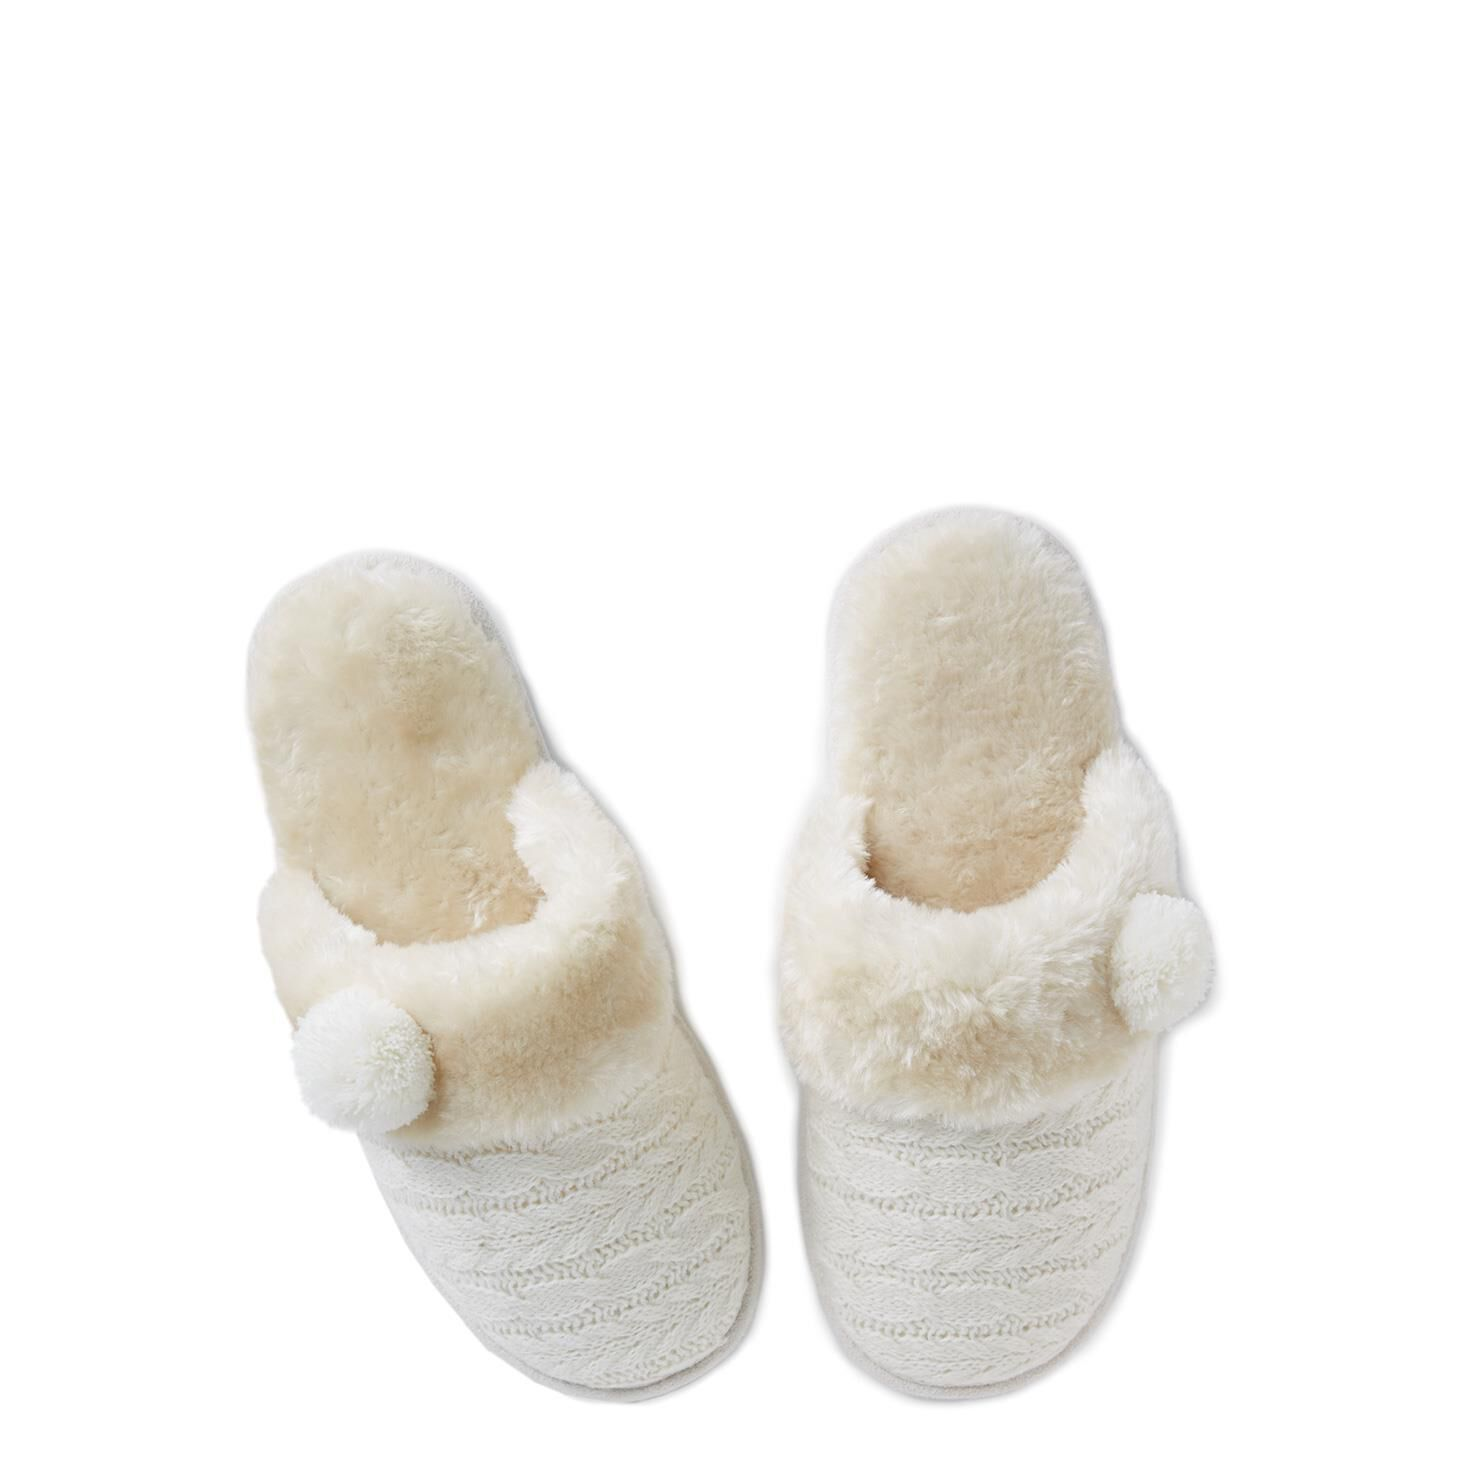 Ivory Cable Knit Slippers Sleep Hallmark